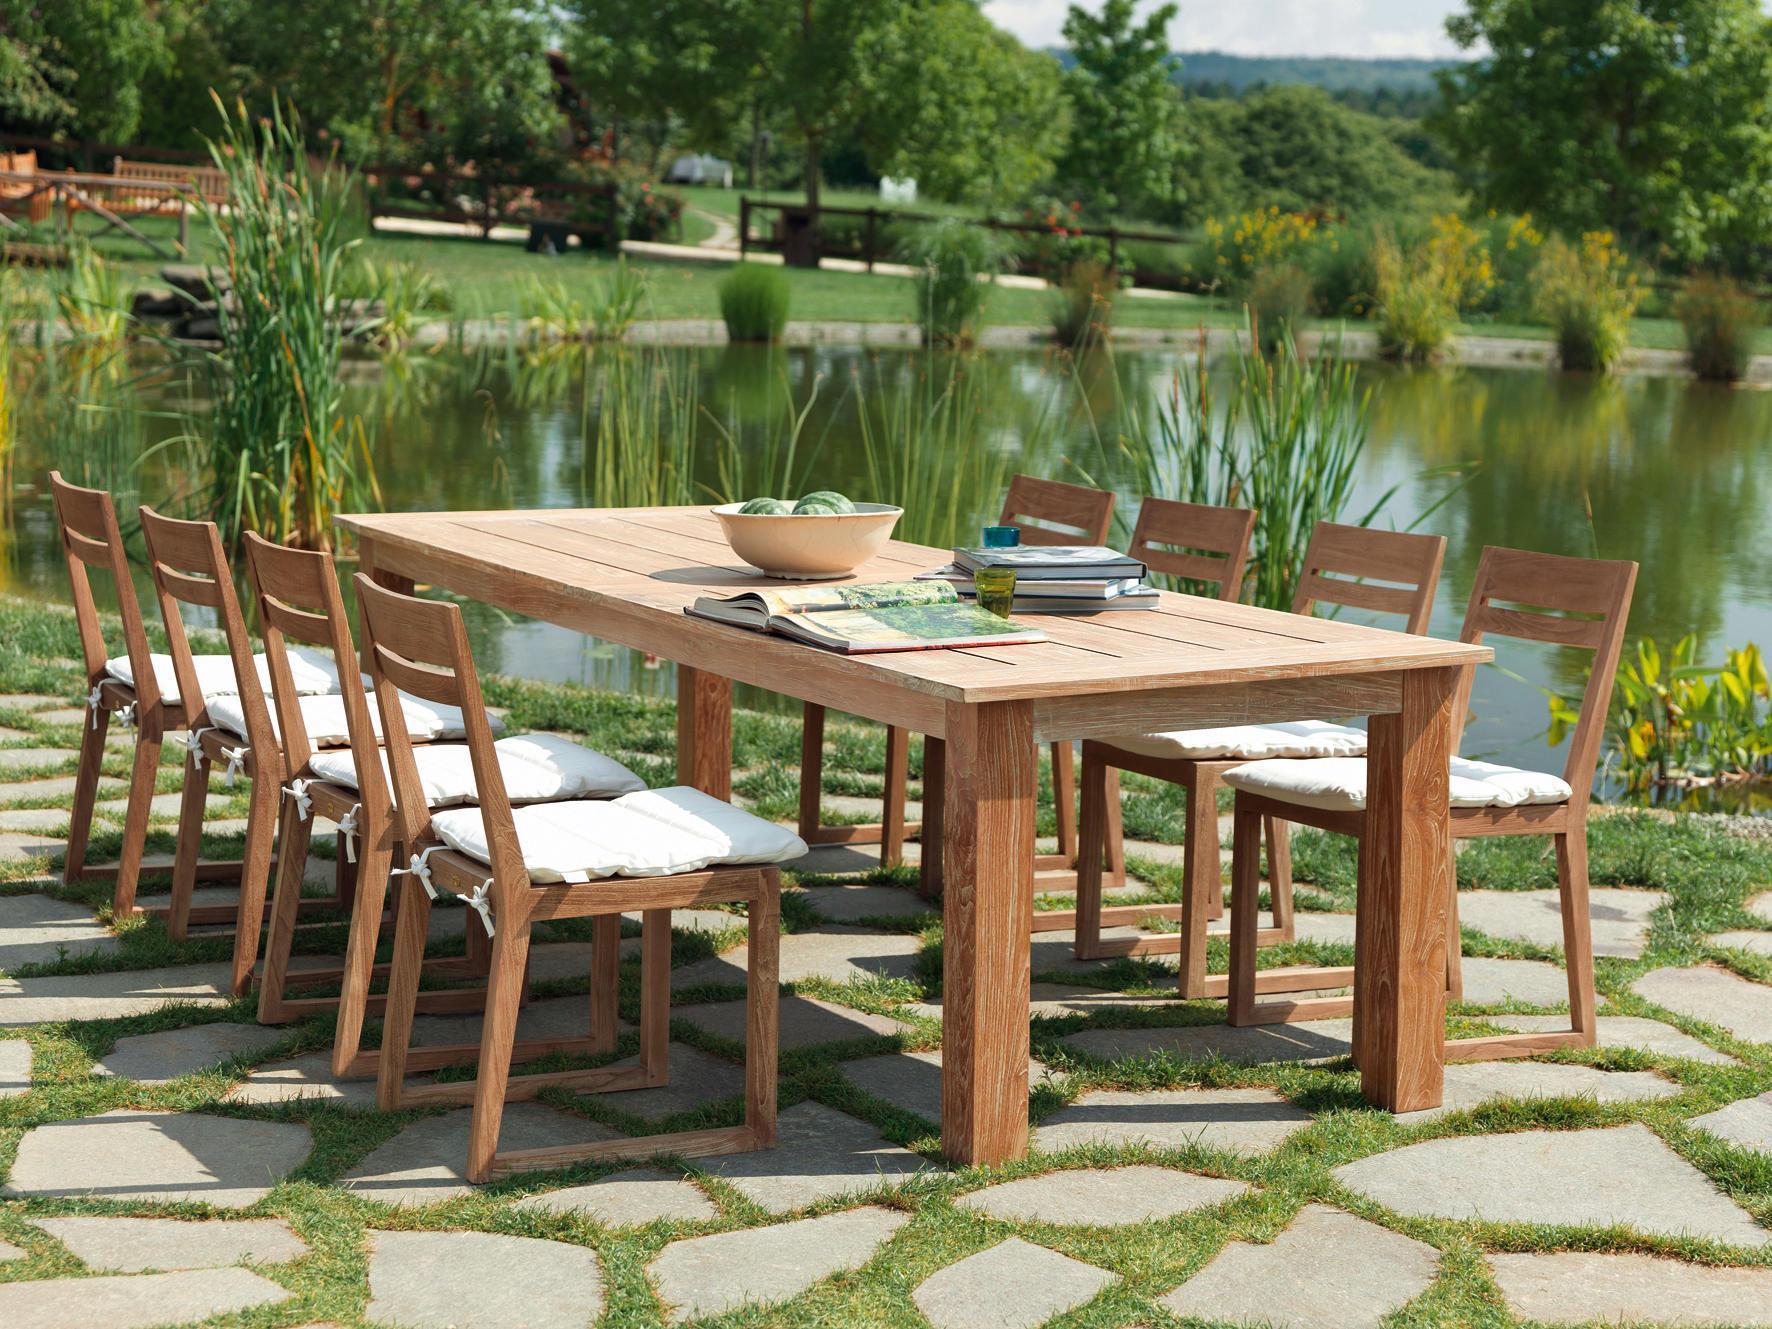 Tavoli legno unopiu tavoli da giardino uno piu